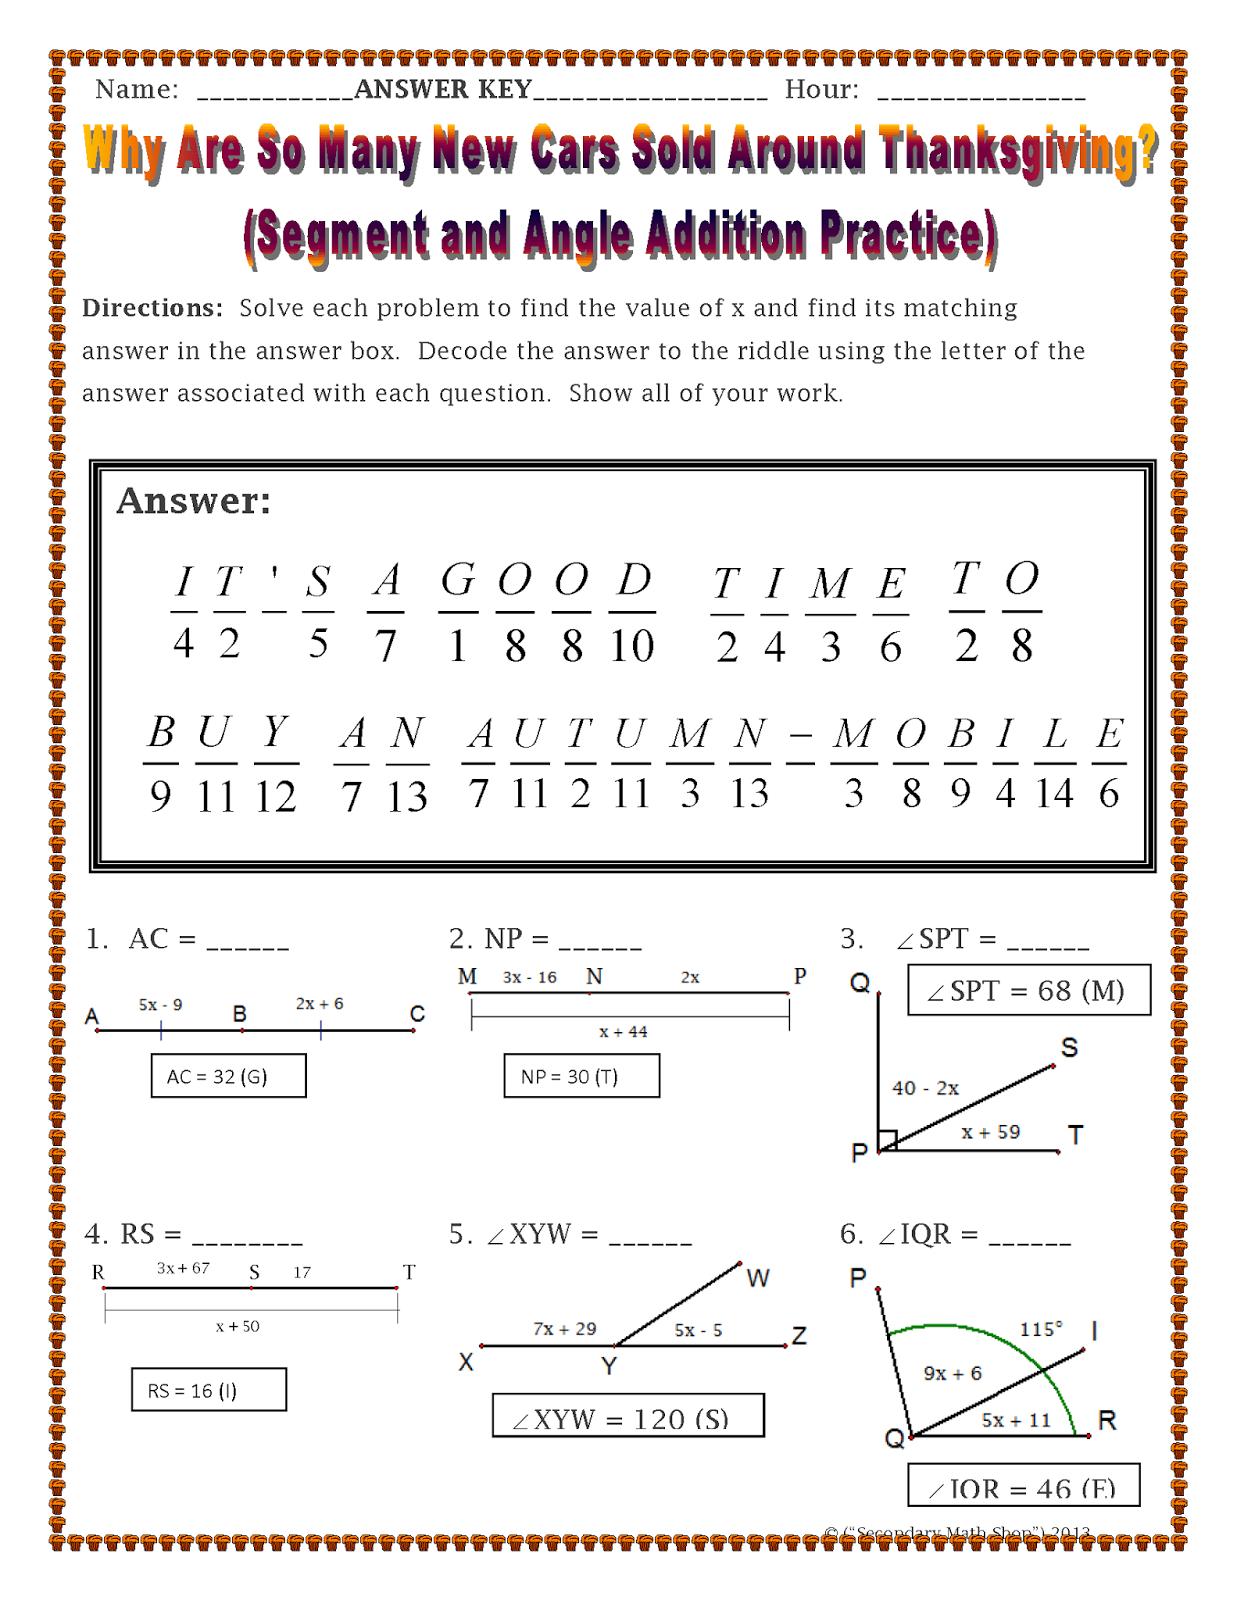 5 Riddle Math Worksheet Answers - Worksheet Resource Plans